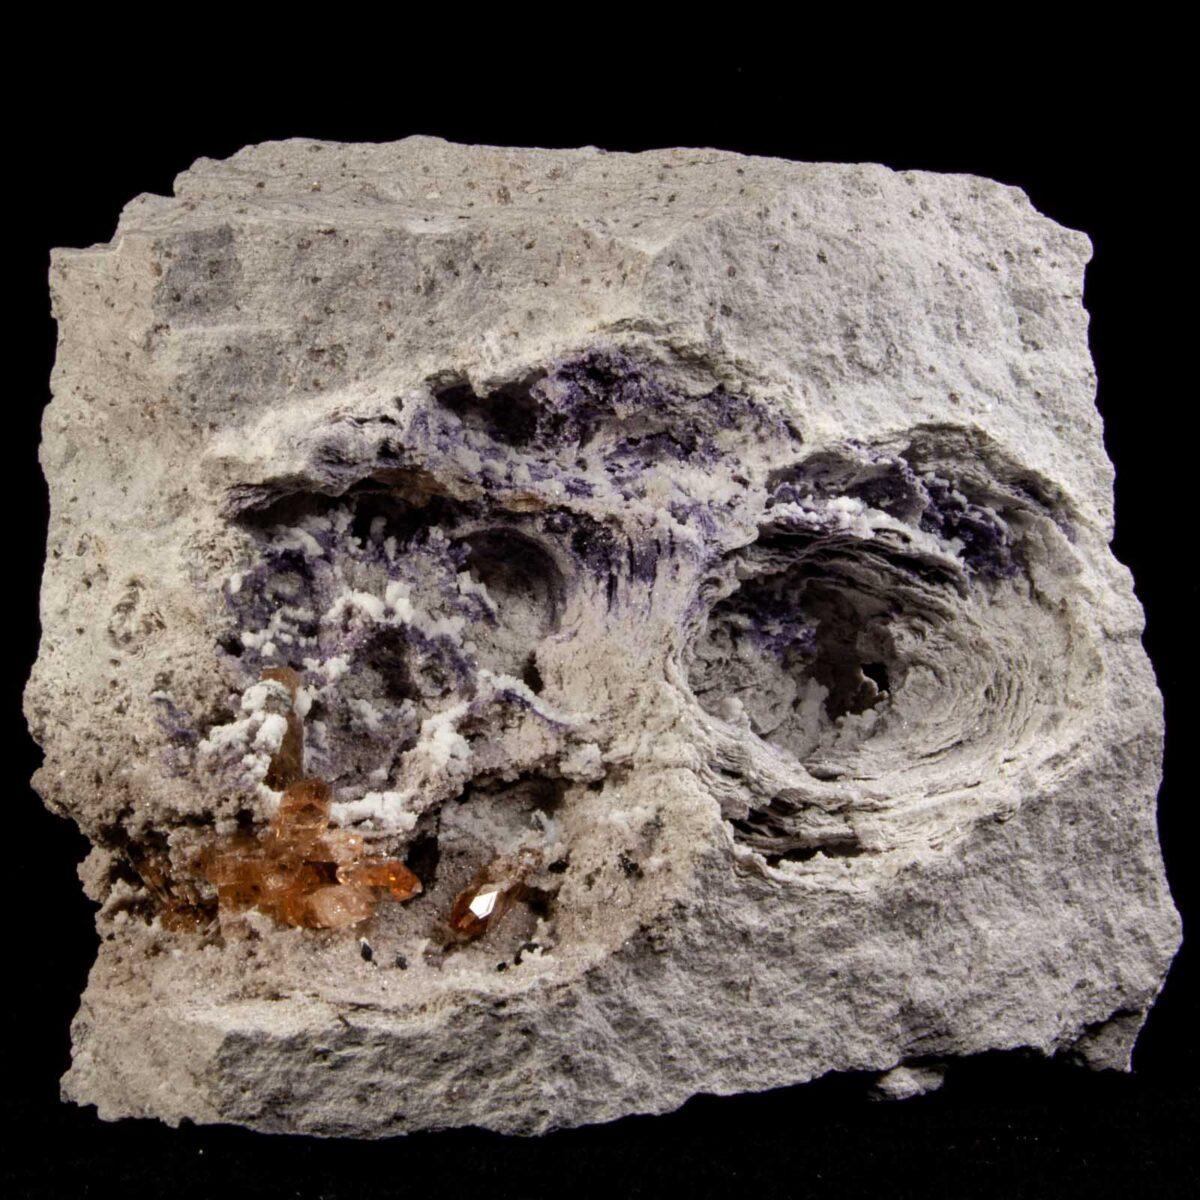 Topaz and Fluorite in Rhyolite